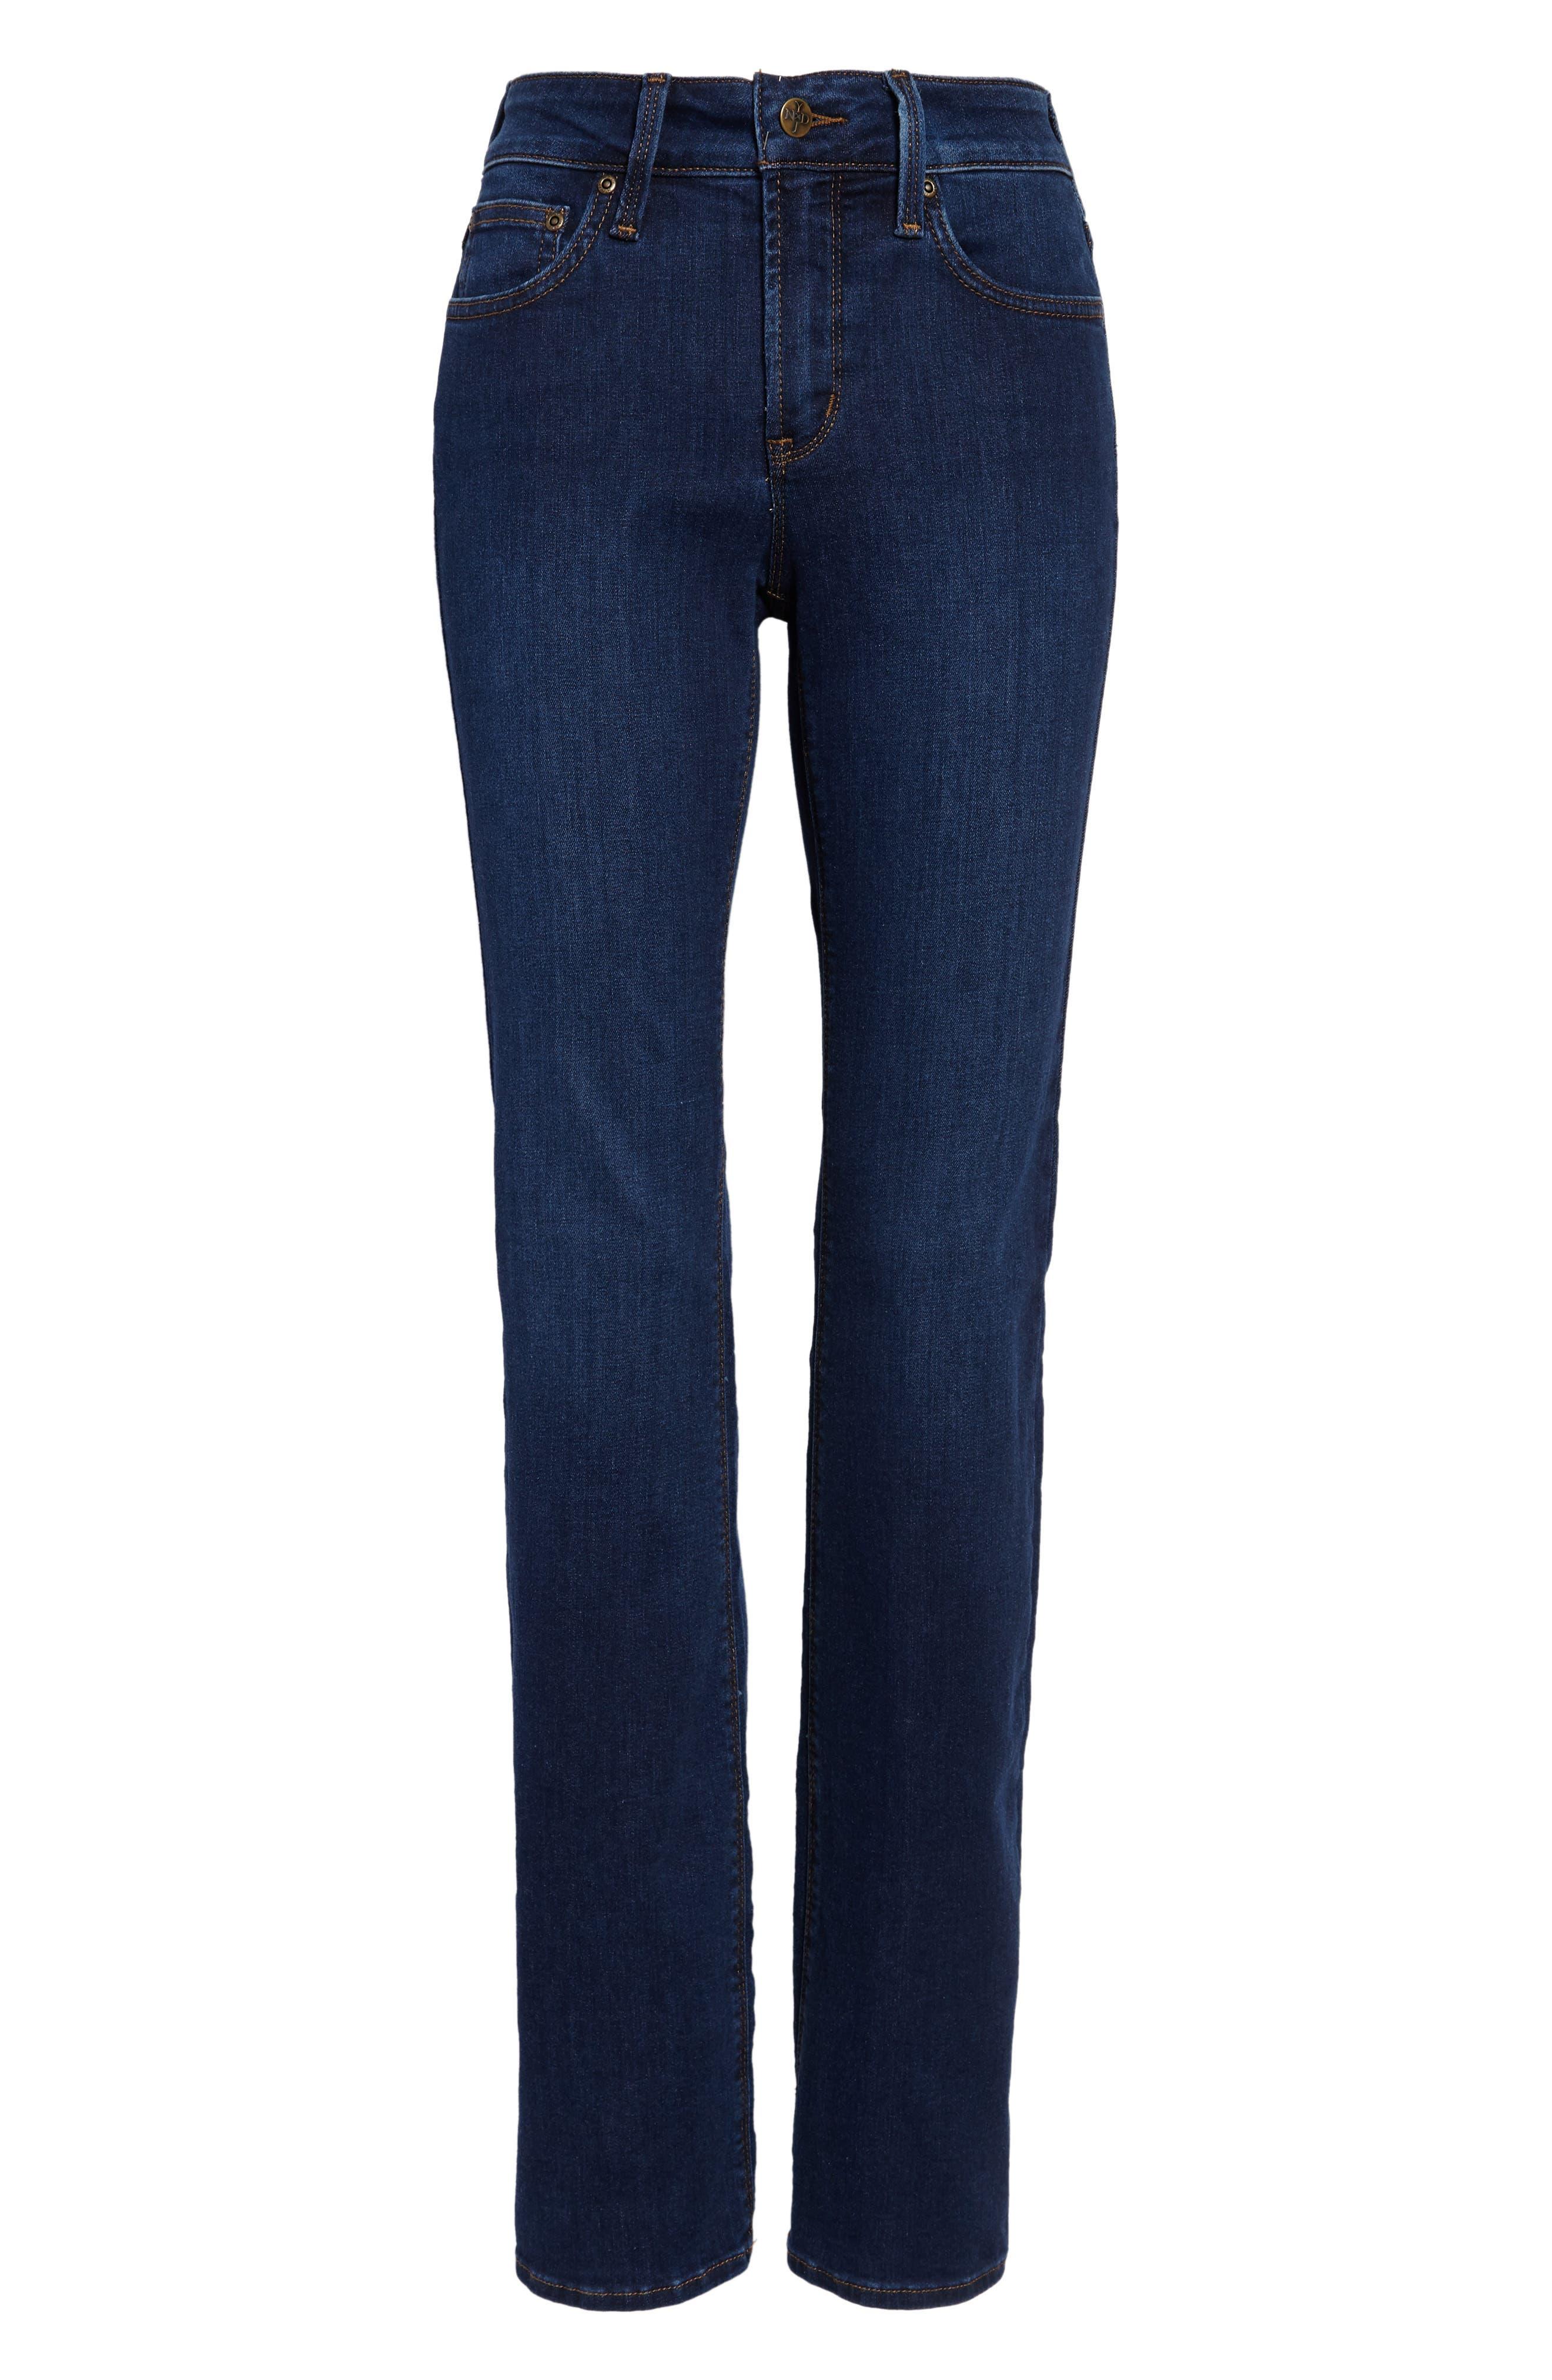 NYDJ, Barbara High Waist Stretch Bootcut Jeans, Alternate thumbnail 5, color, COOPER